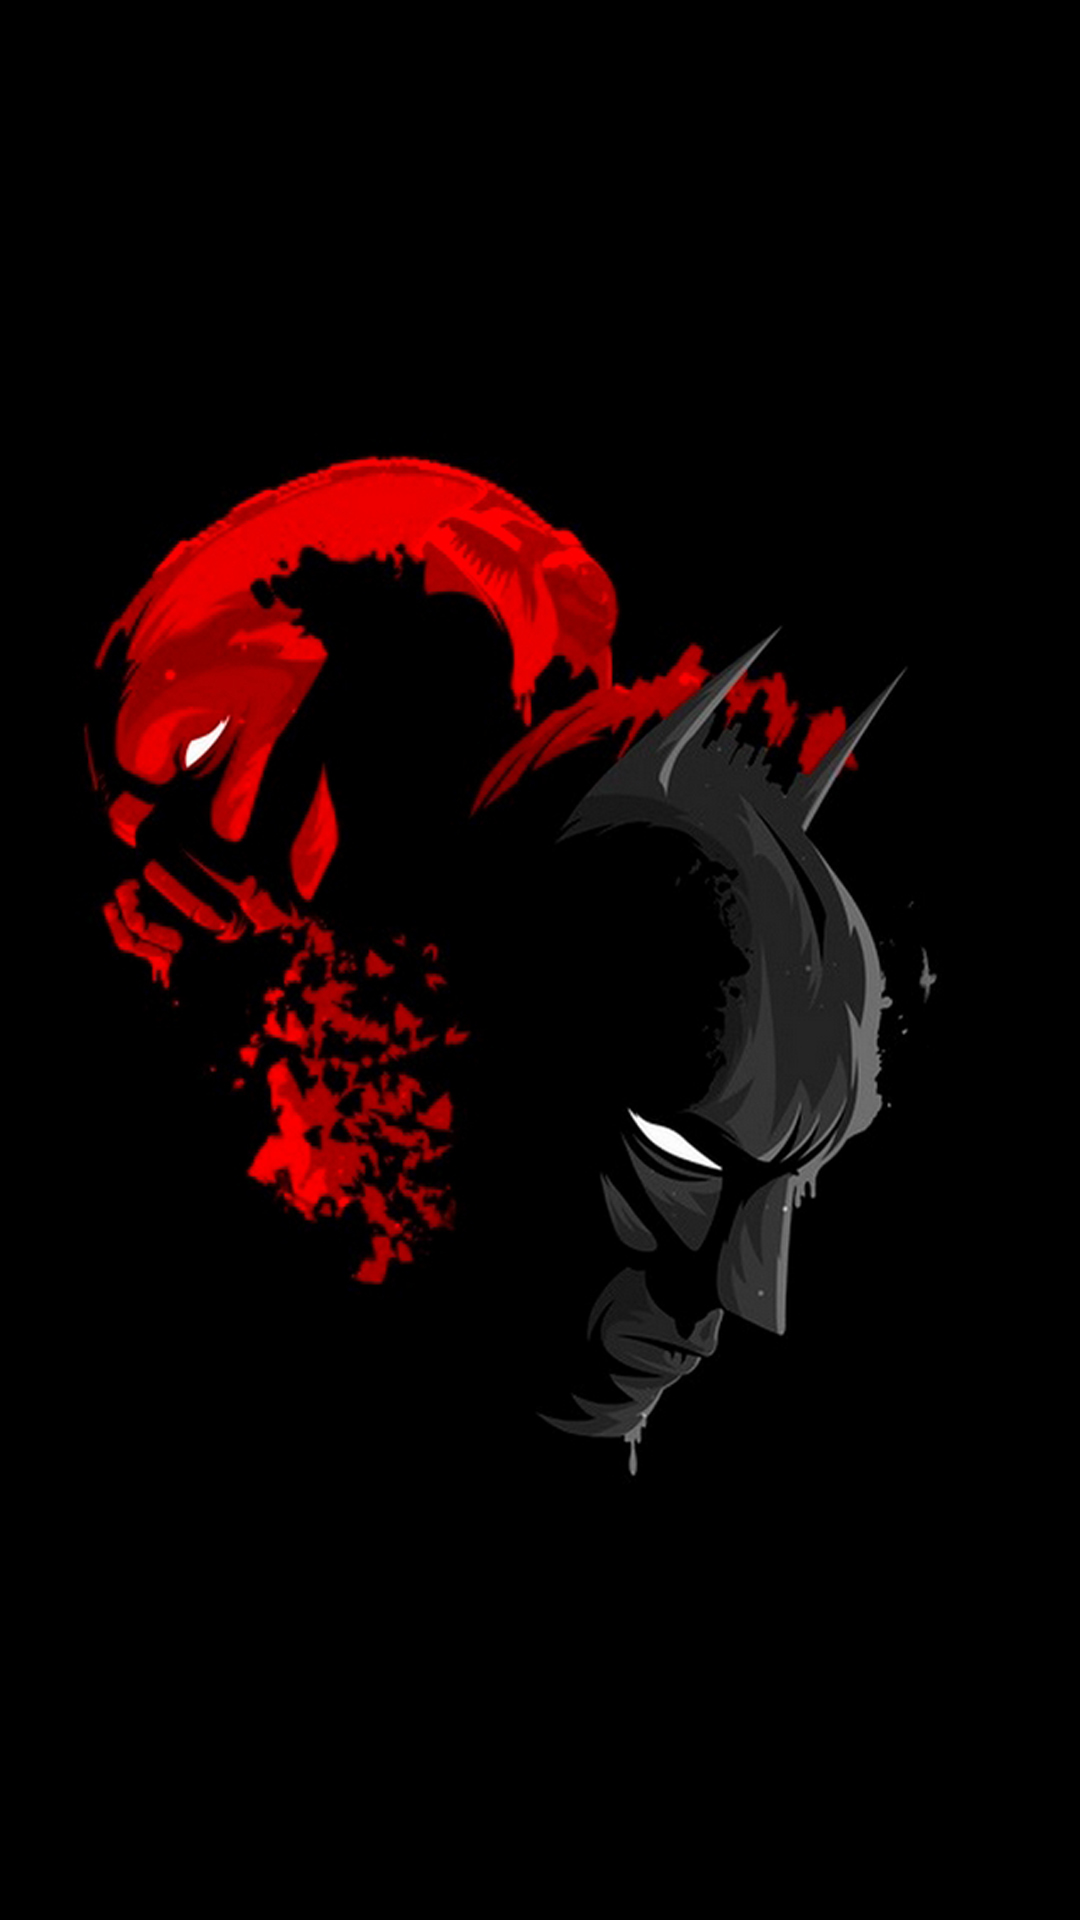 Superhero Wallpaper Iphone Posted By Ryan Mercado